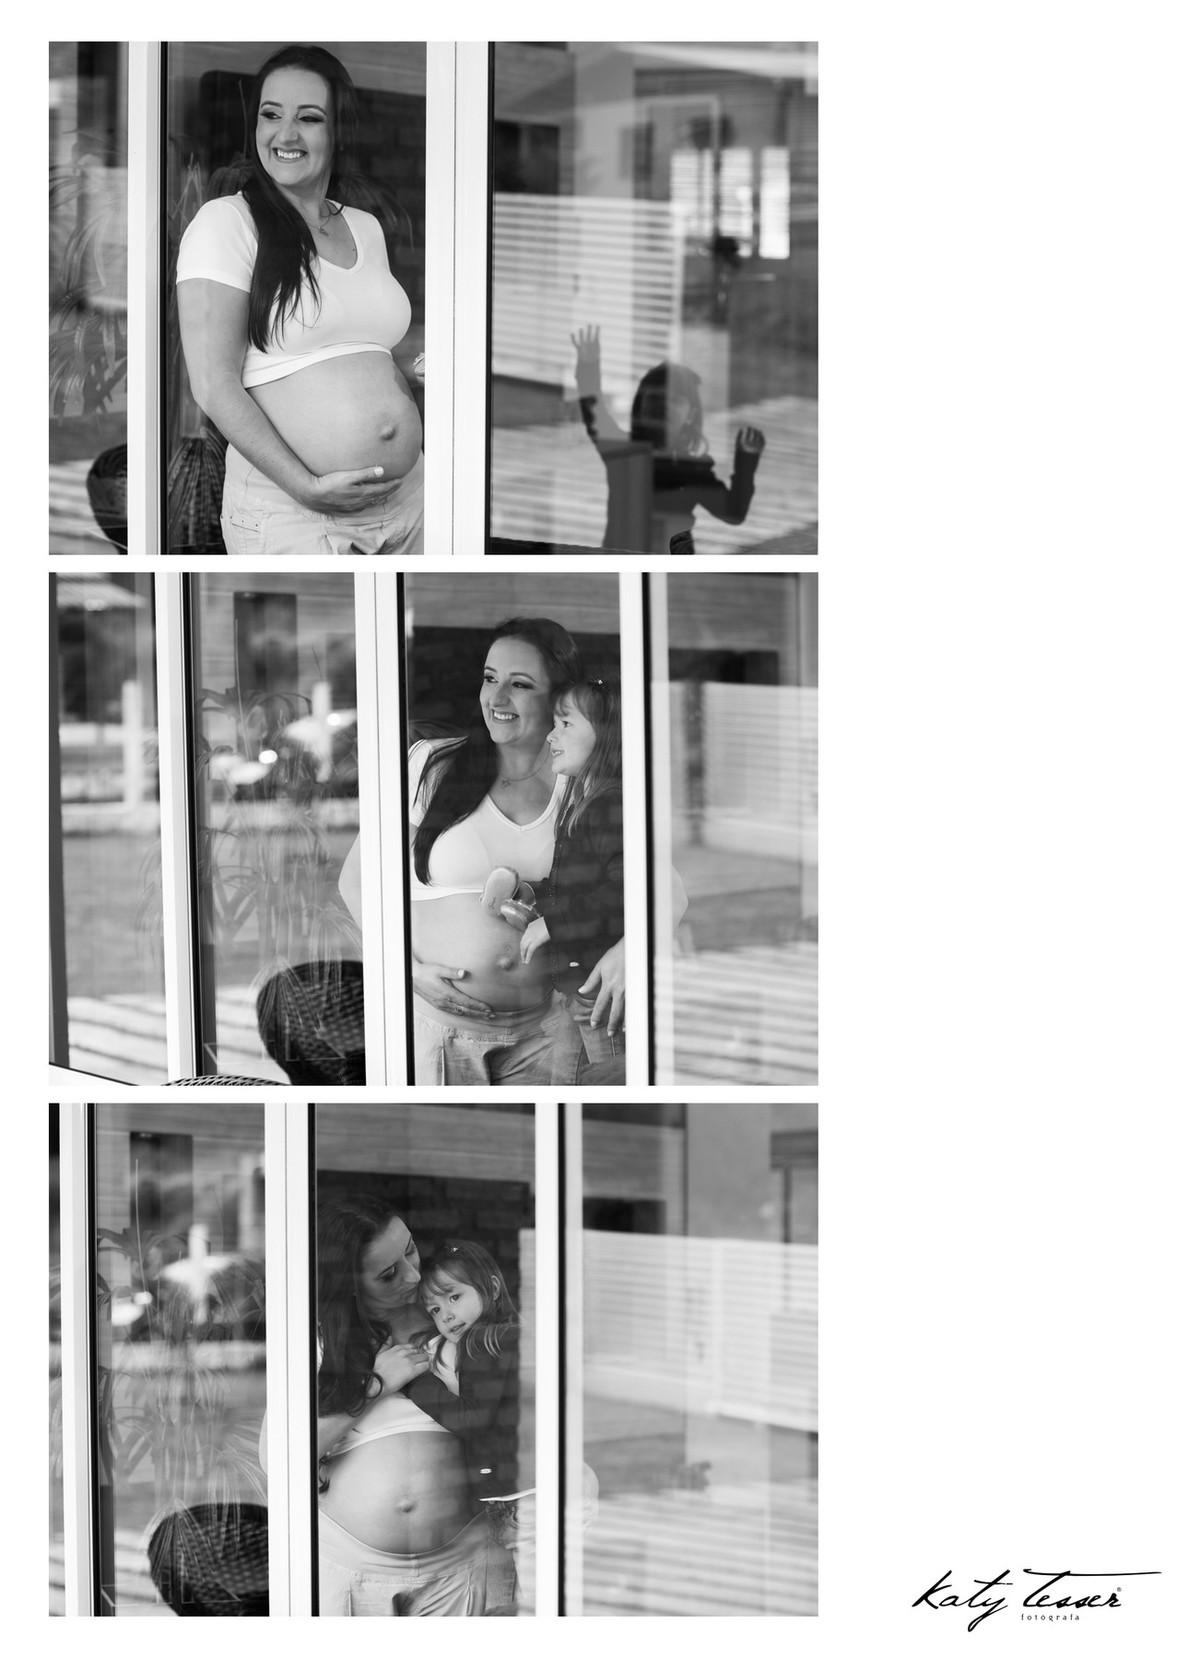 Katy Tesser, Fotografa, Fotografo, book gestante, fotos de gestante, book externo, fotos externas criativas